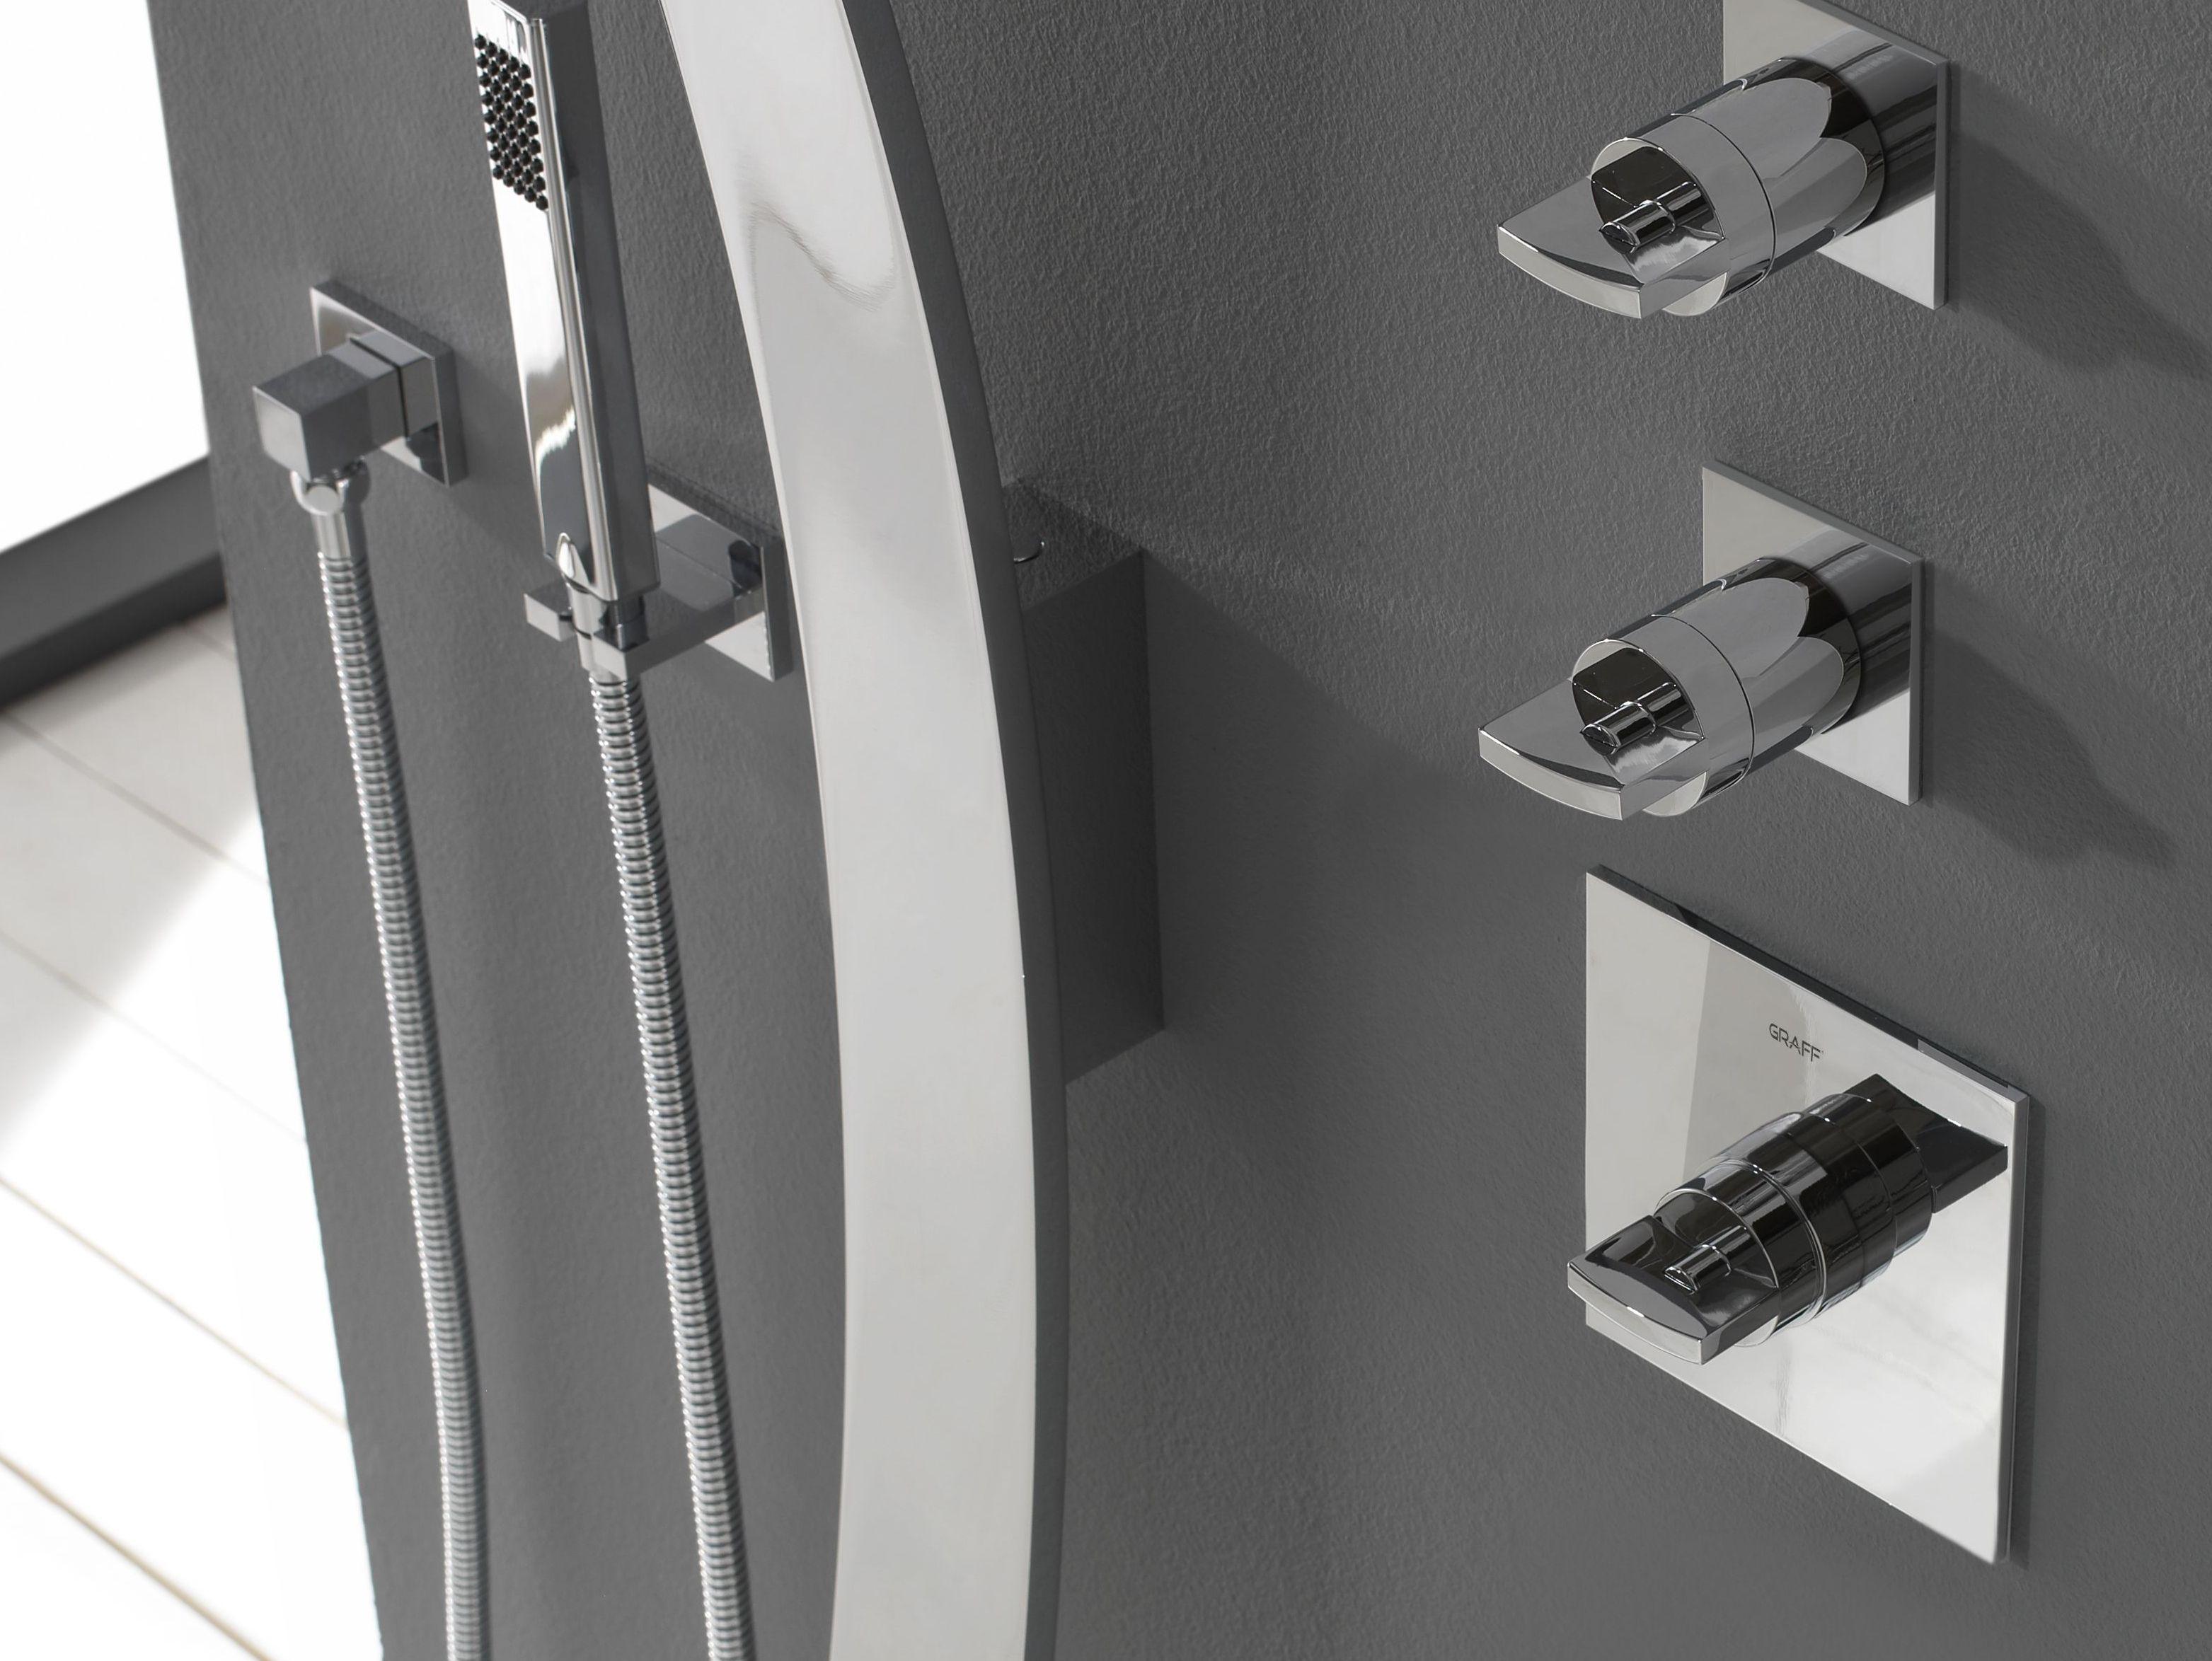 Luna miscelatore termostatico per doccia by graff europe west - Miscelatori bagno prezzi ...